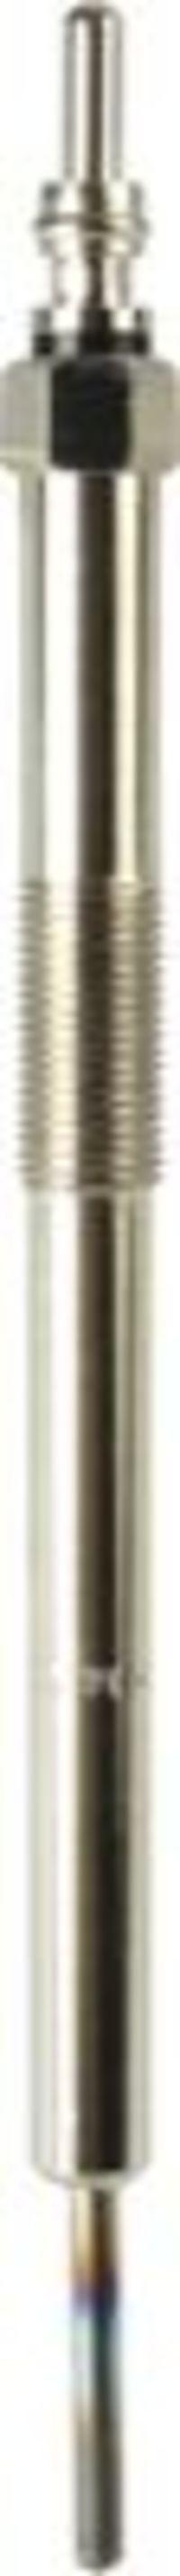 Свеча накаливания HERTH+BUSS JAKOPARTS J5711032